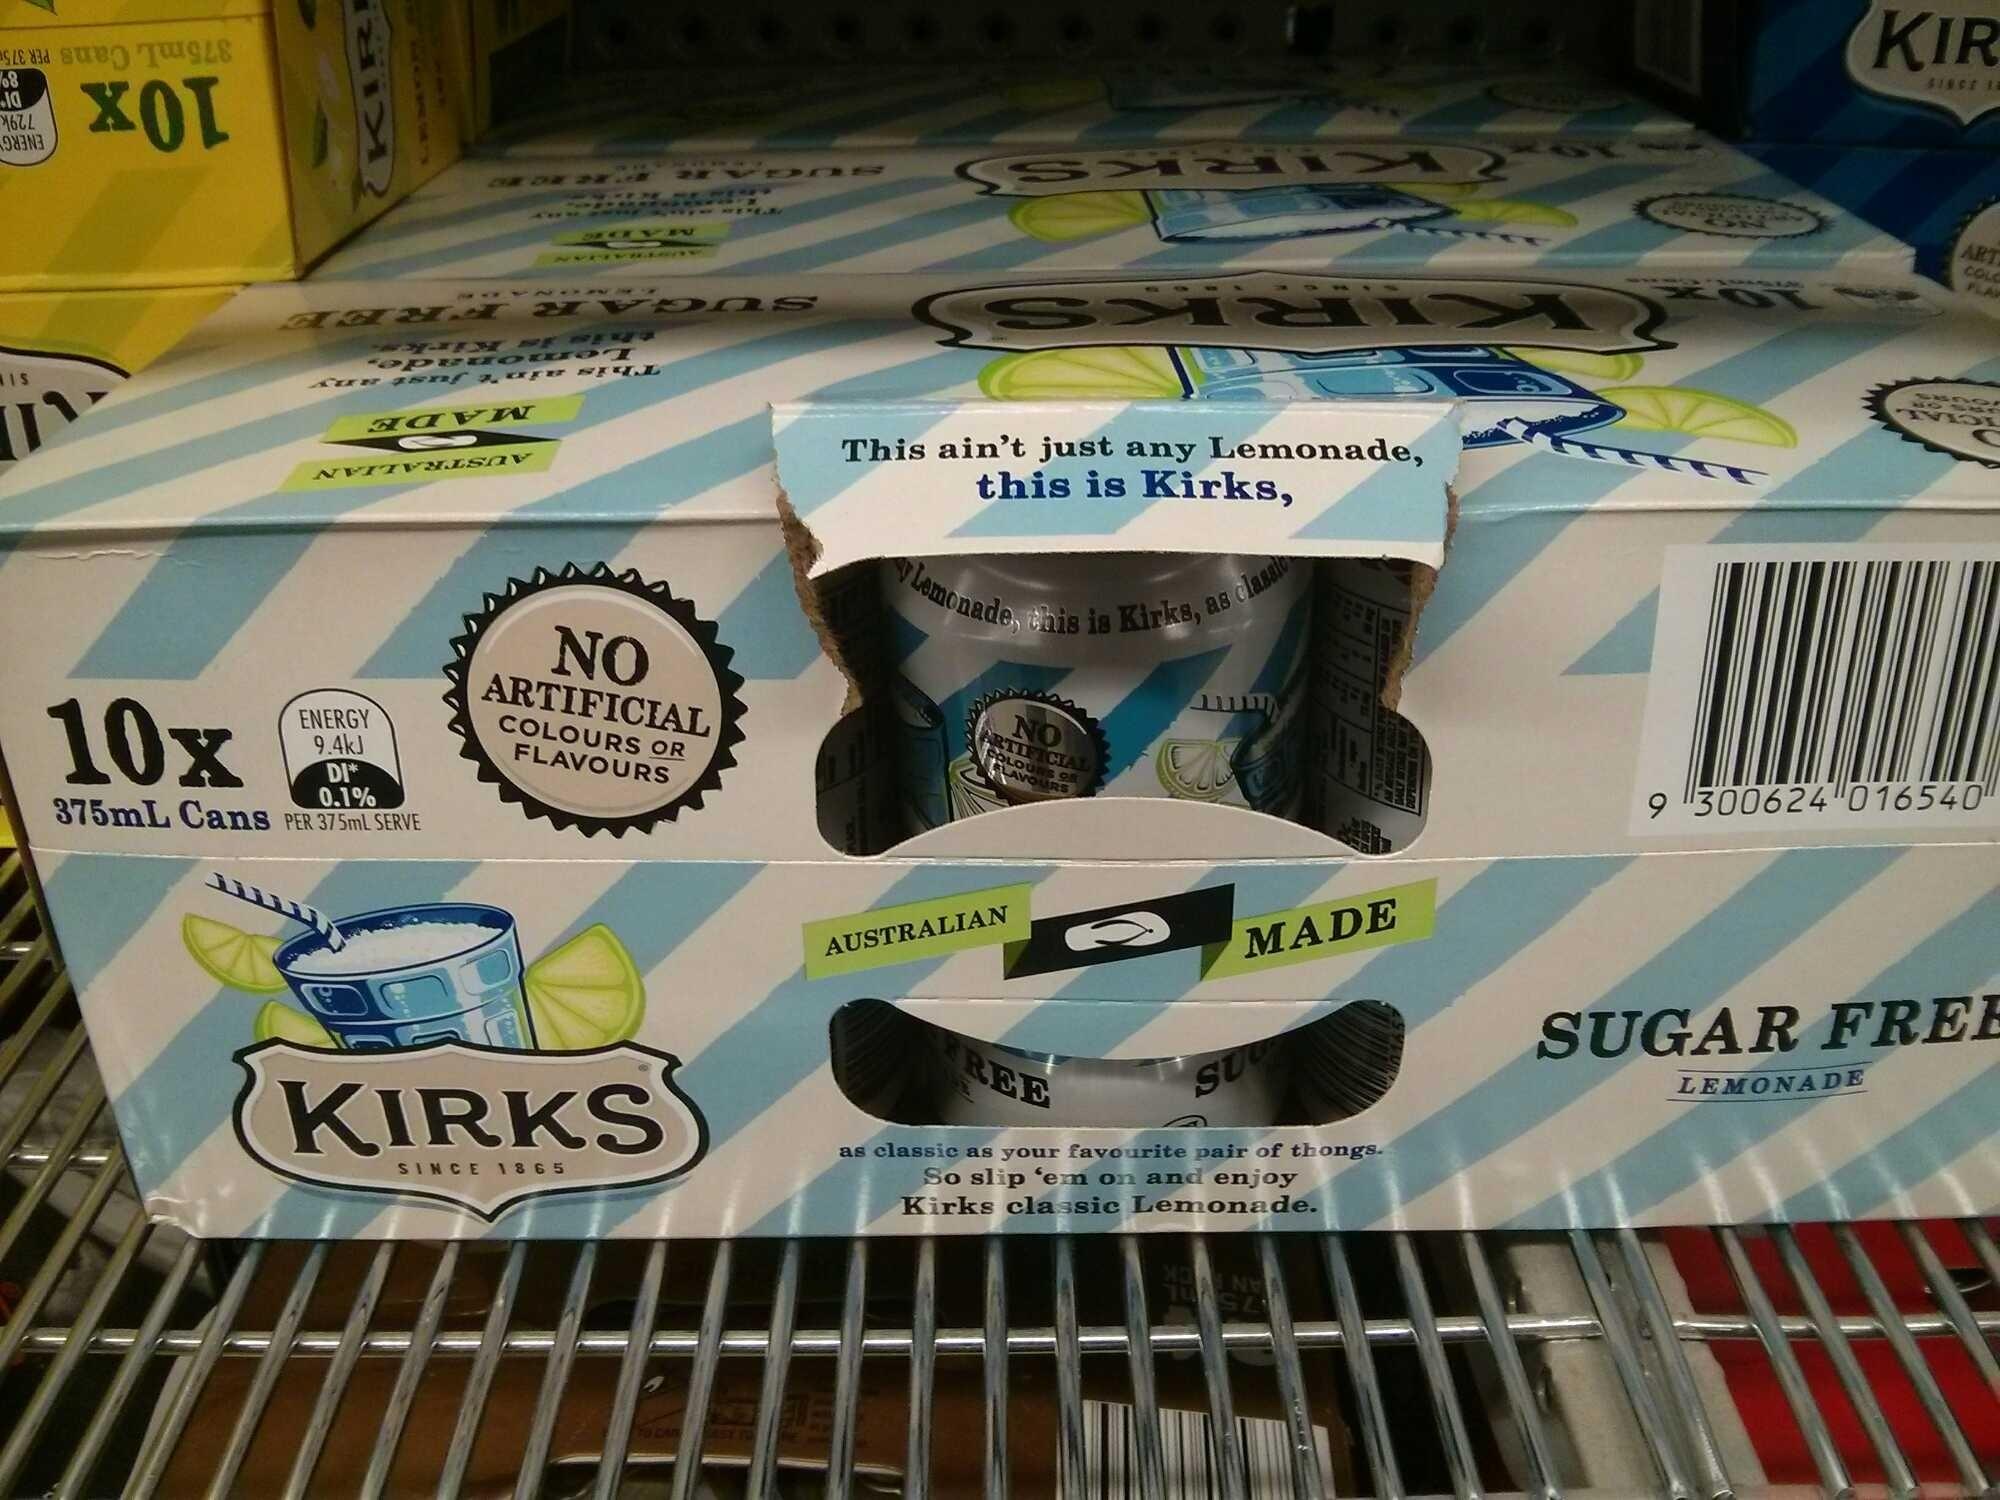 sugar free lemonade - Product - en